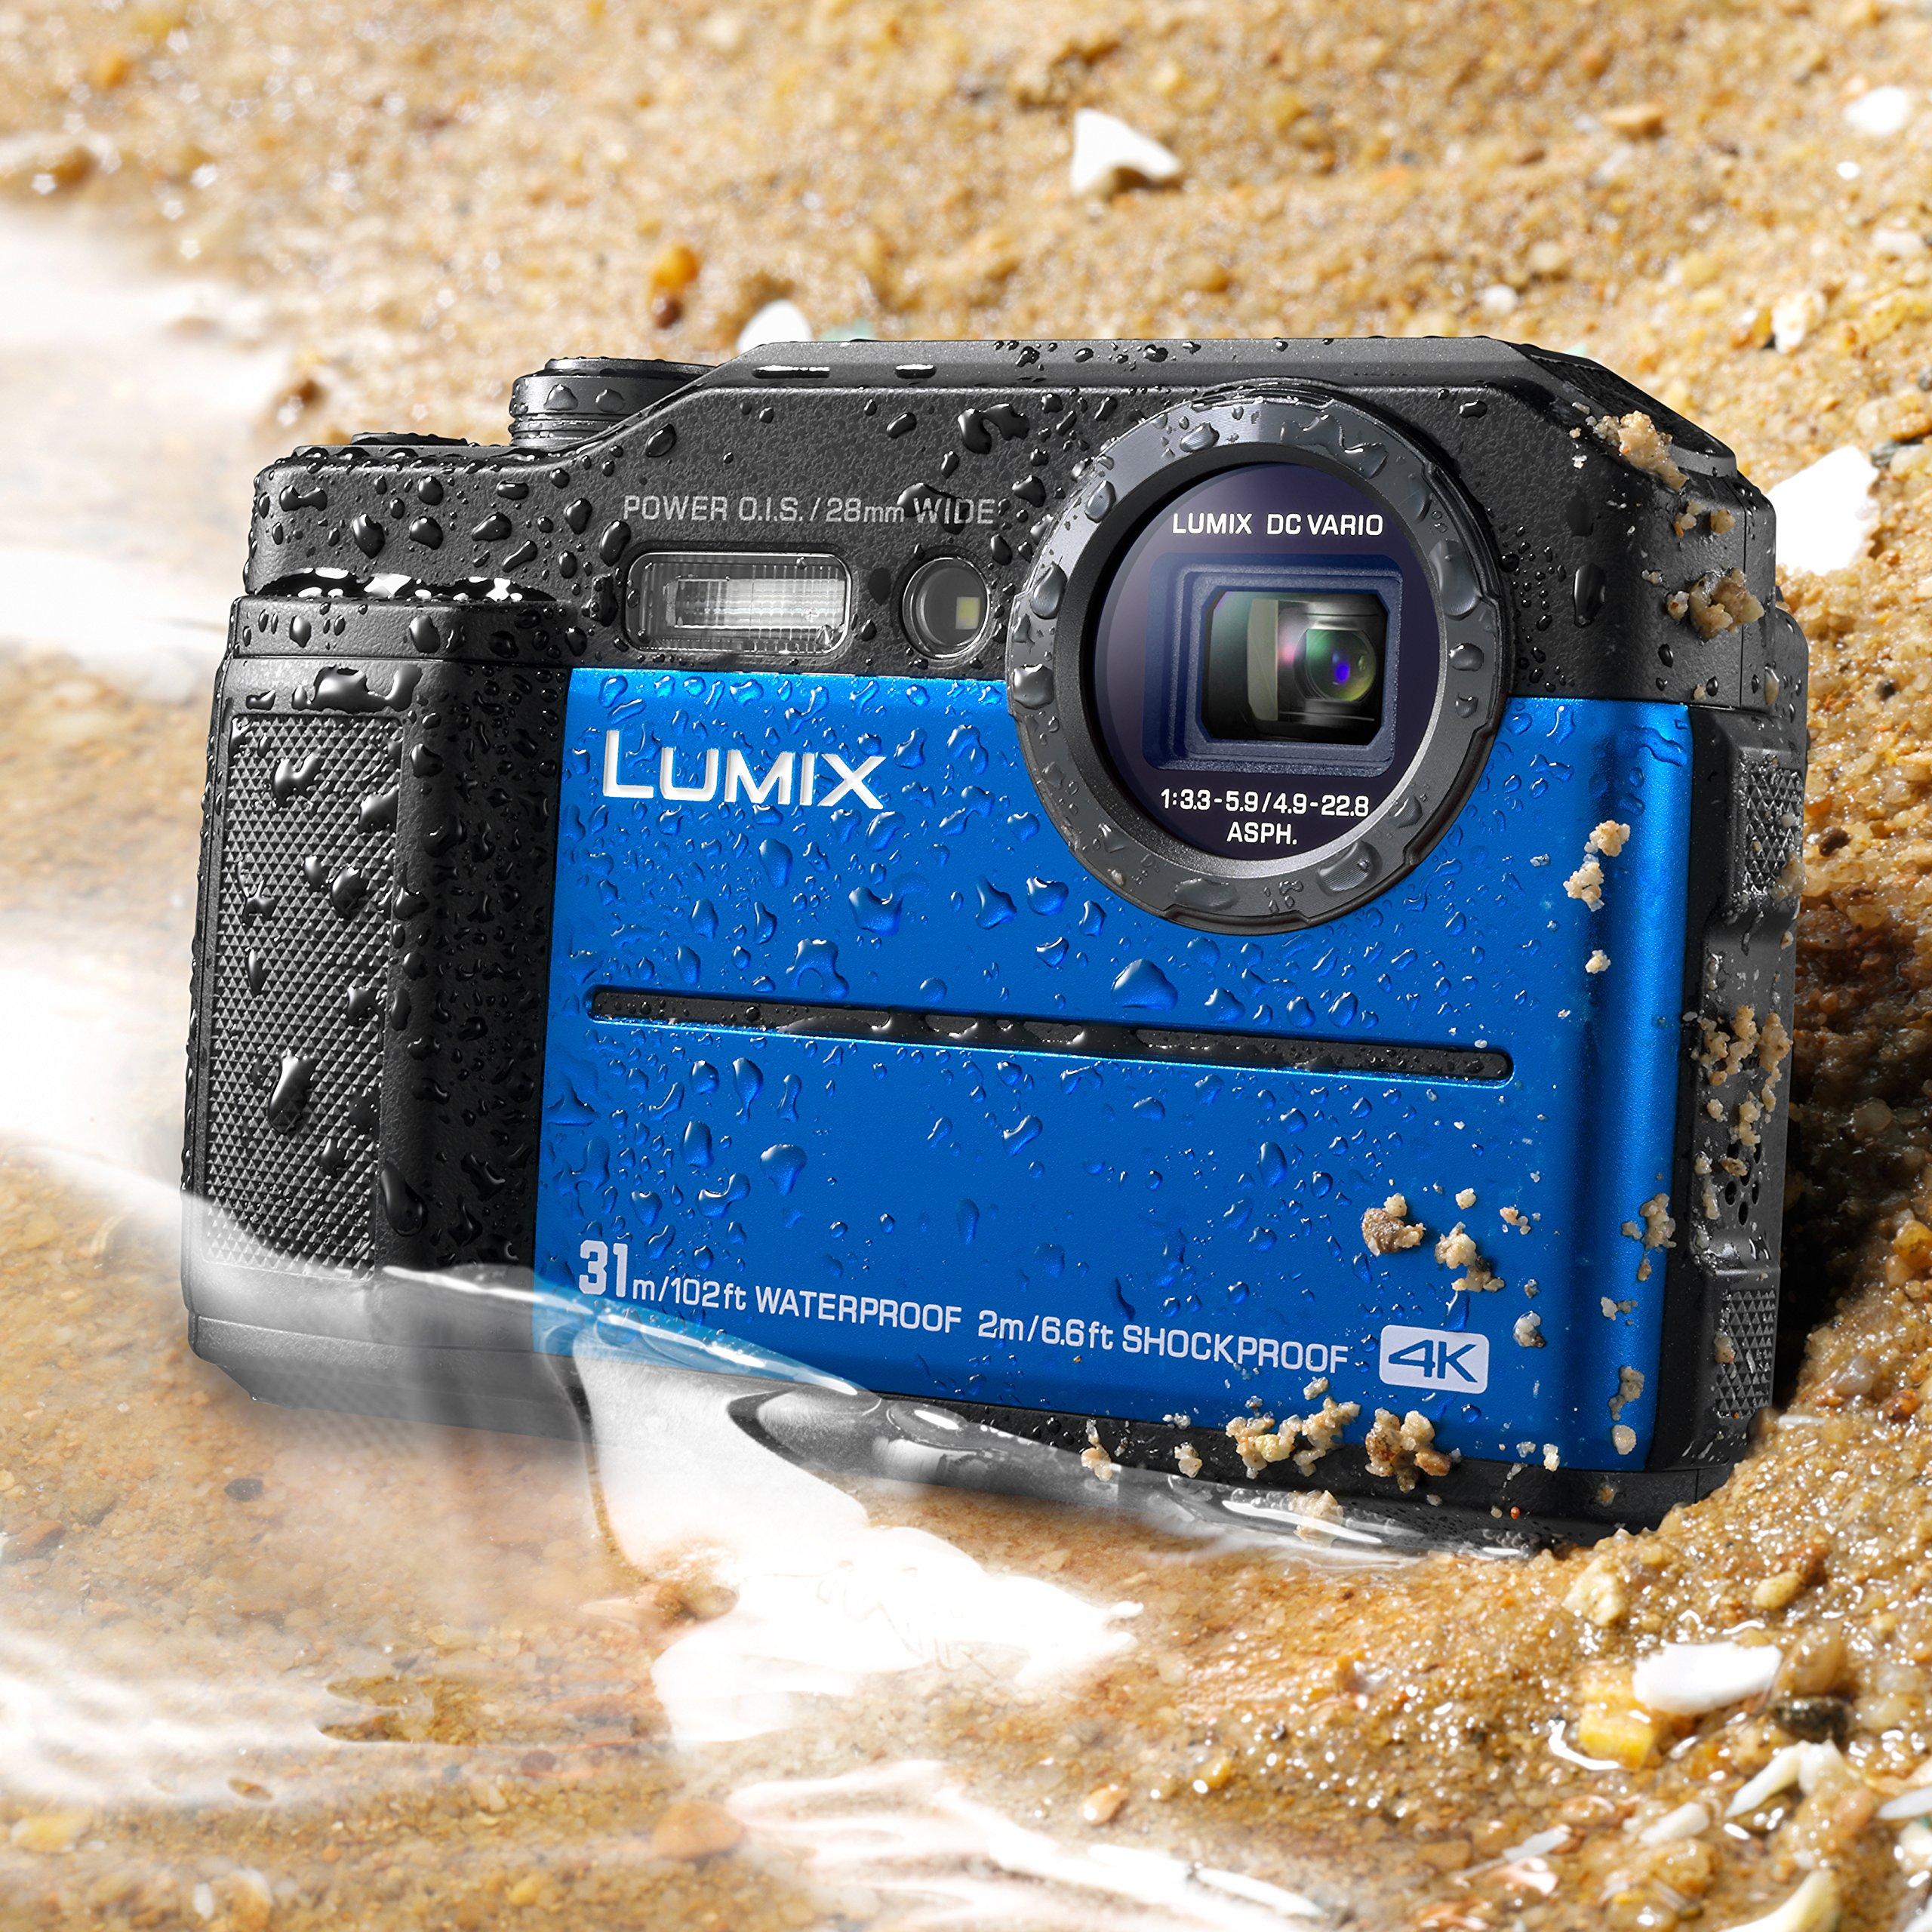 "Panasonic DC-TS7A Lumix TS7 Waterproof Tough Camera, 20.4 Megapixels, 4.6X Zoom Lens, USA, with 3"" LCD, Blue"